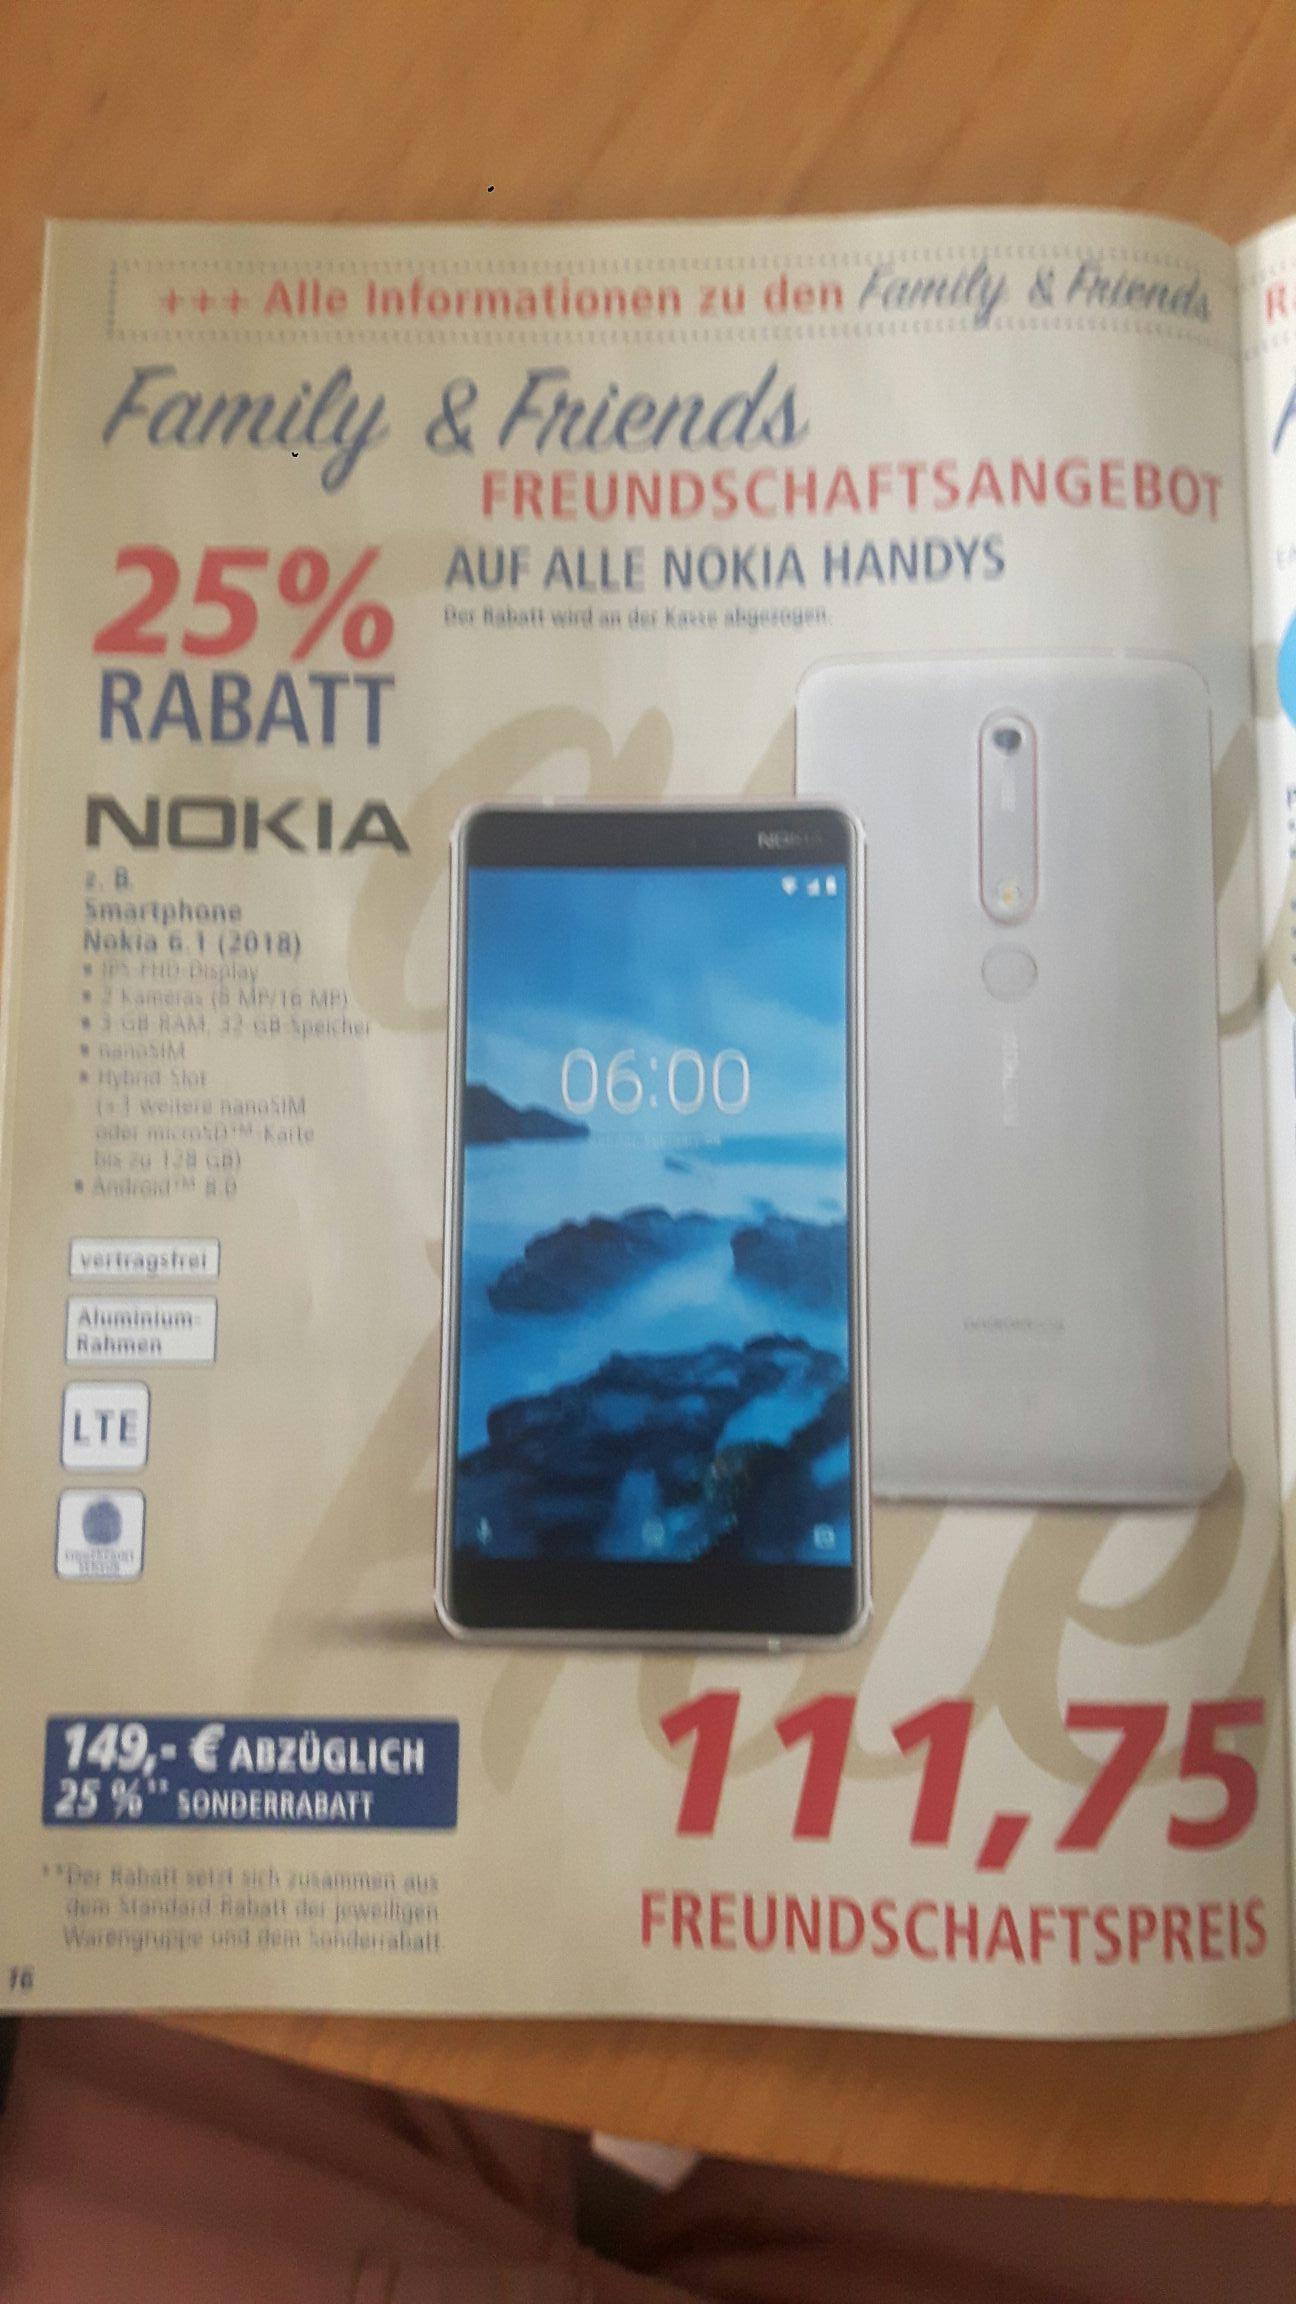 Nokia 6.1 und Nokia 7 Plus Superpreis (dank Family and Friends Coupon  bei Real)